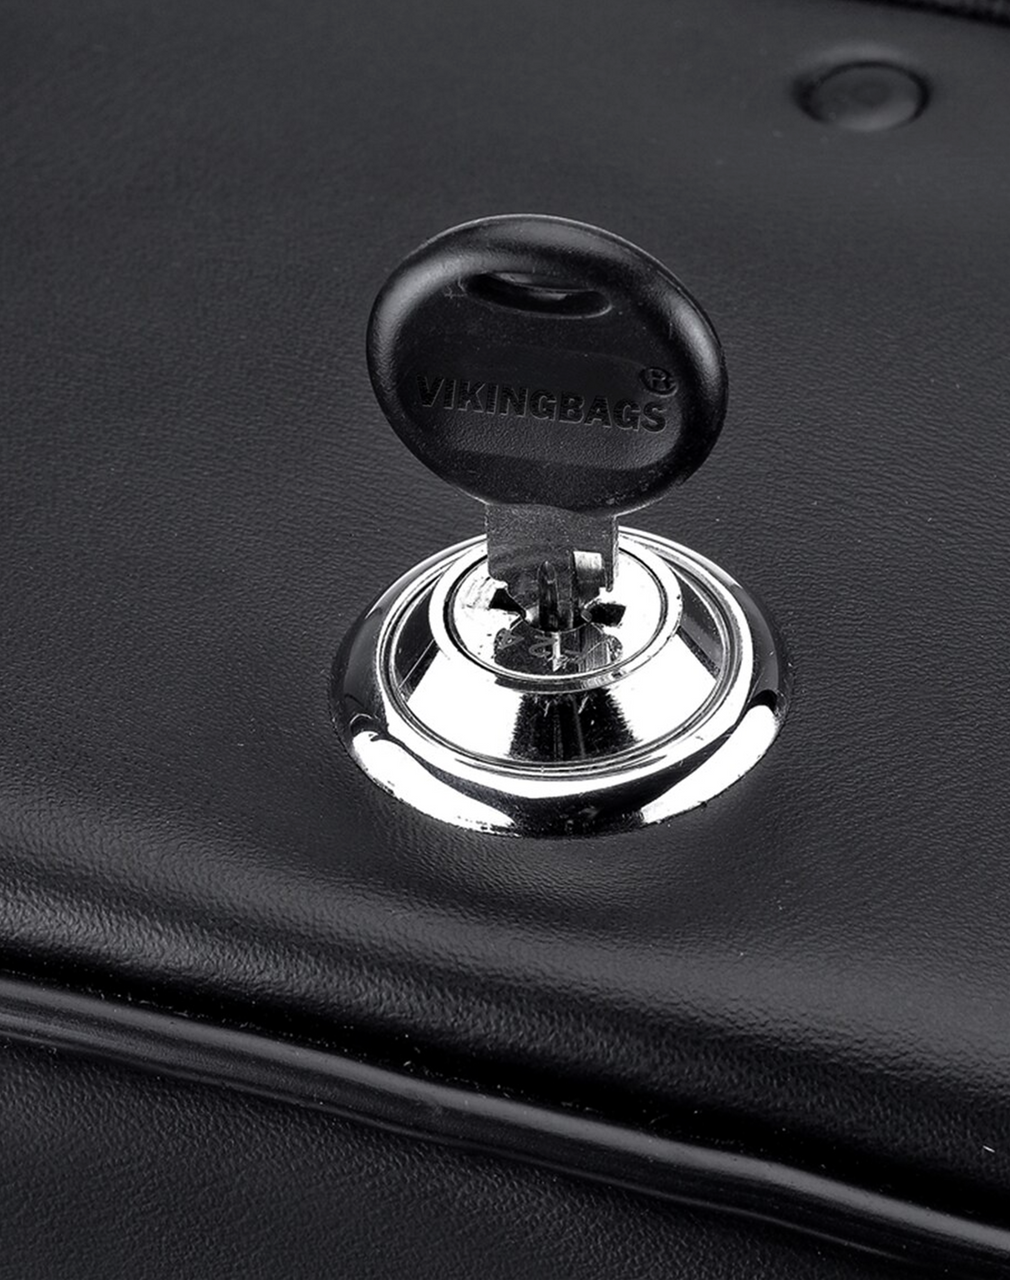 Yamaha V Star 650 Custom Medium Charger Single Strap Motorcycle Saddlebags Key Lockable View